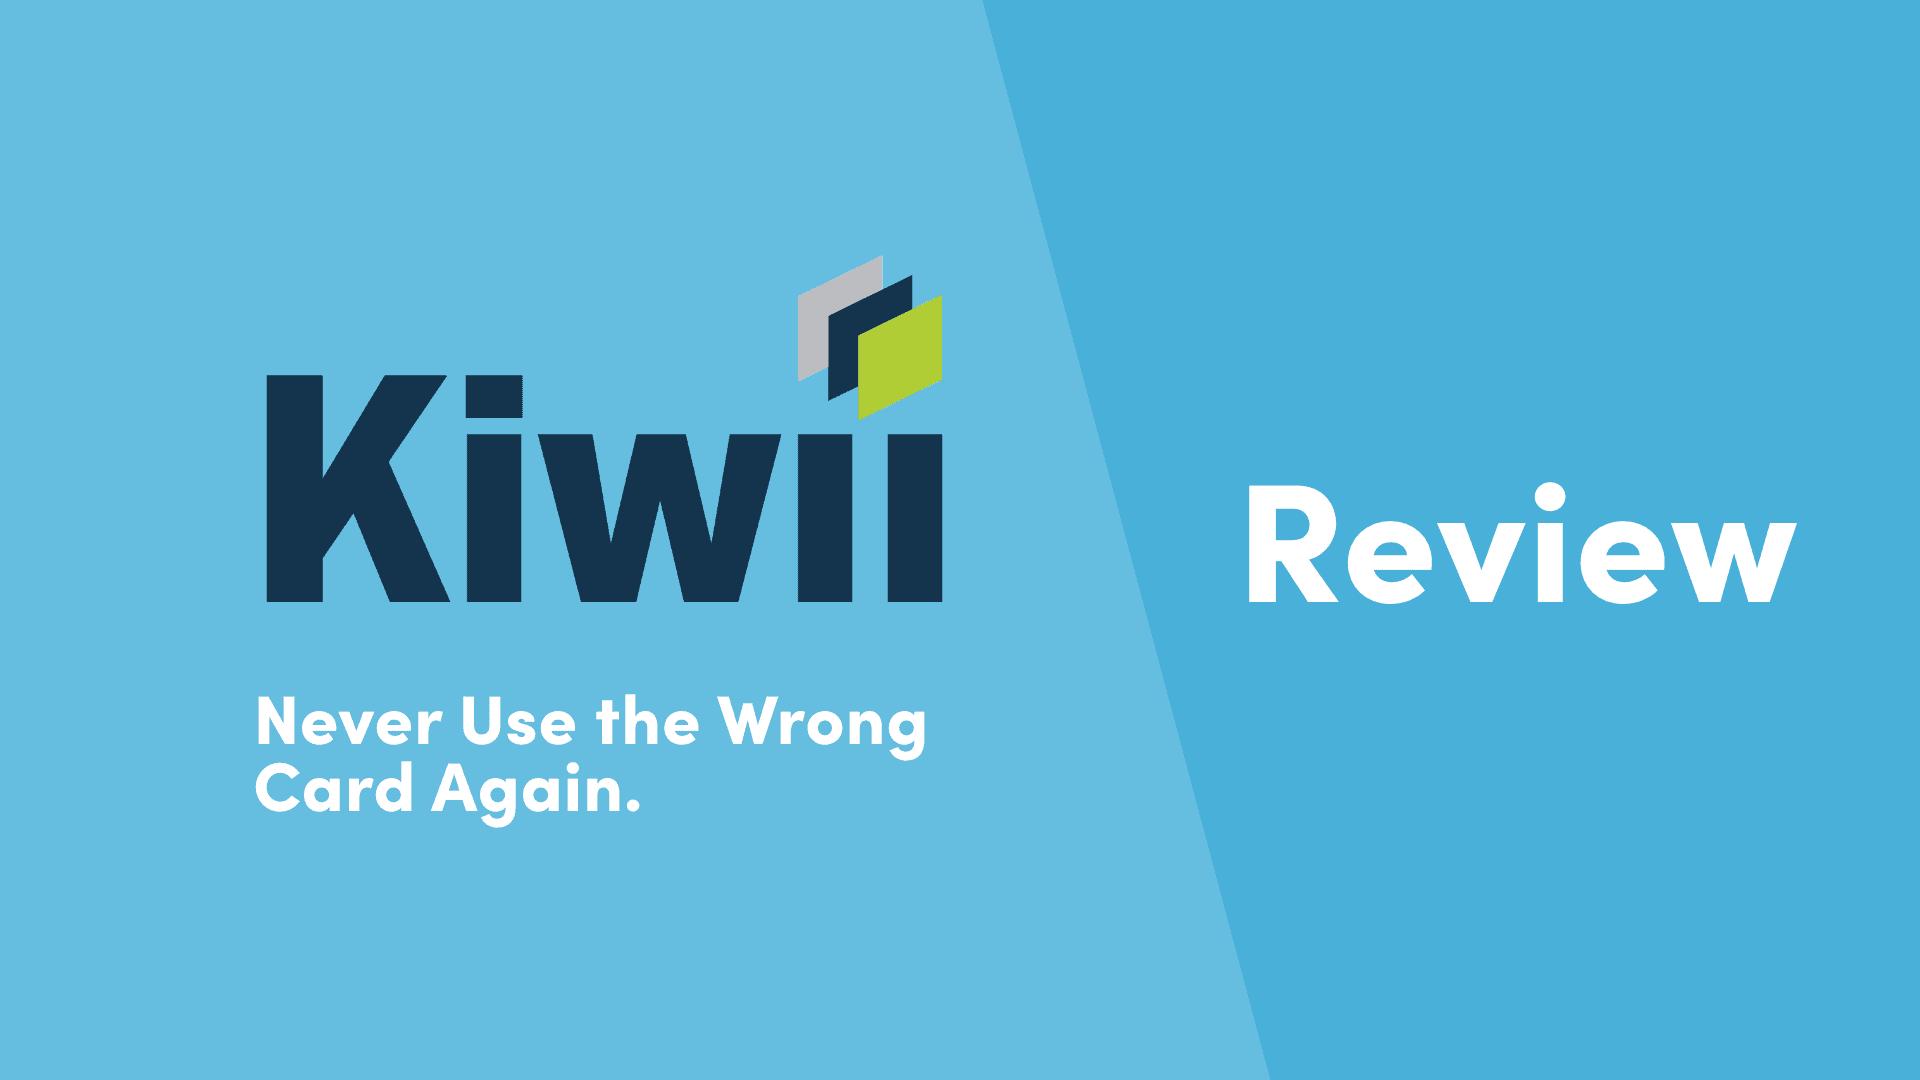 Kiwii_Review